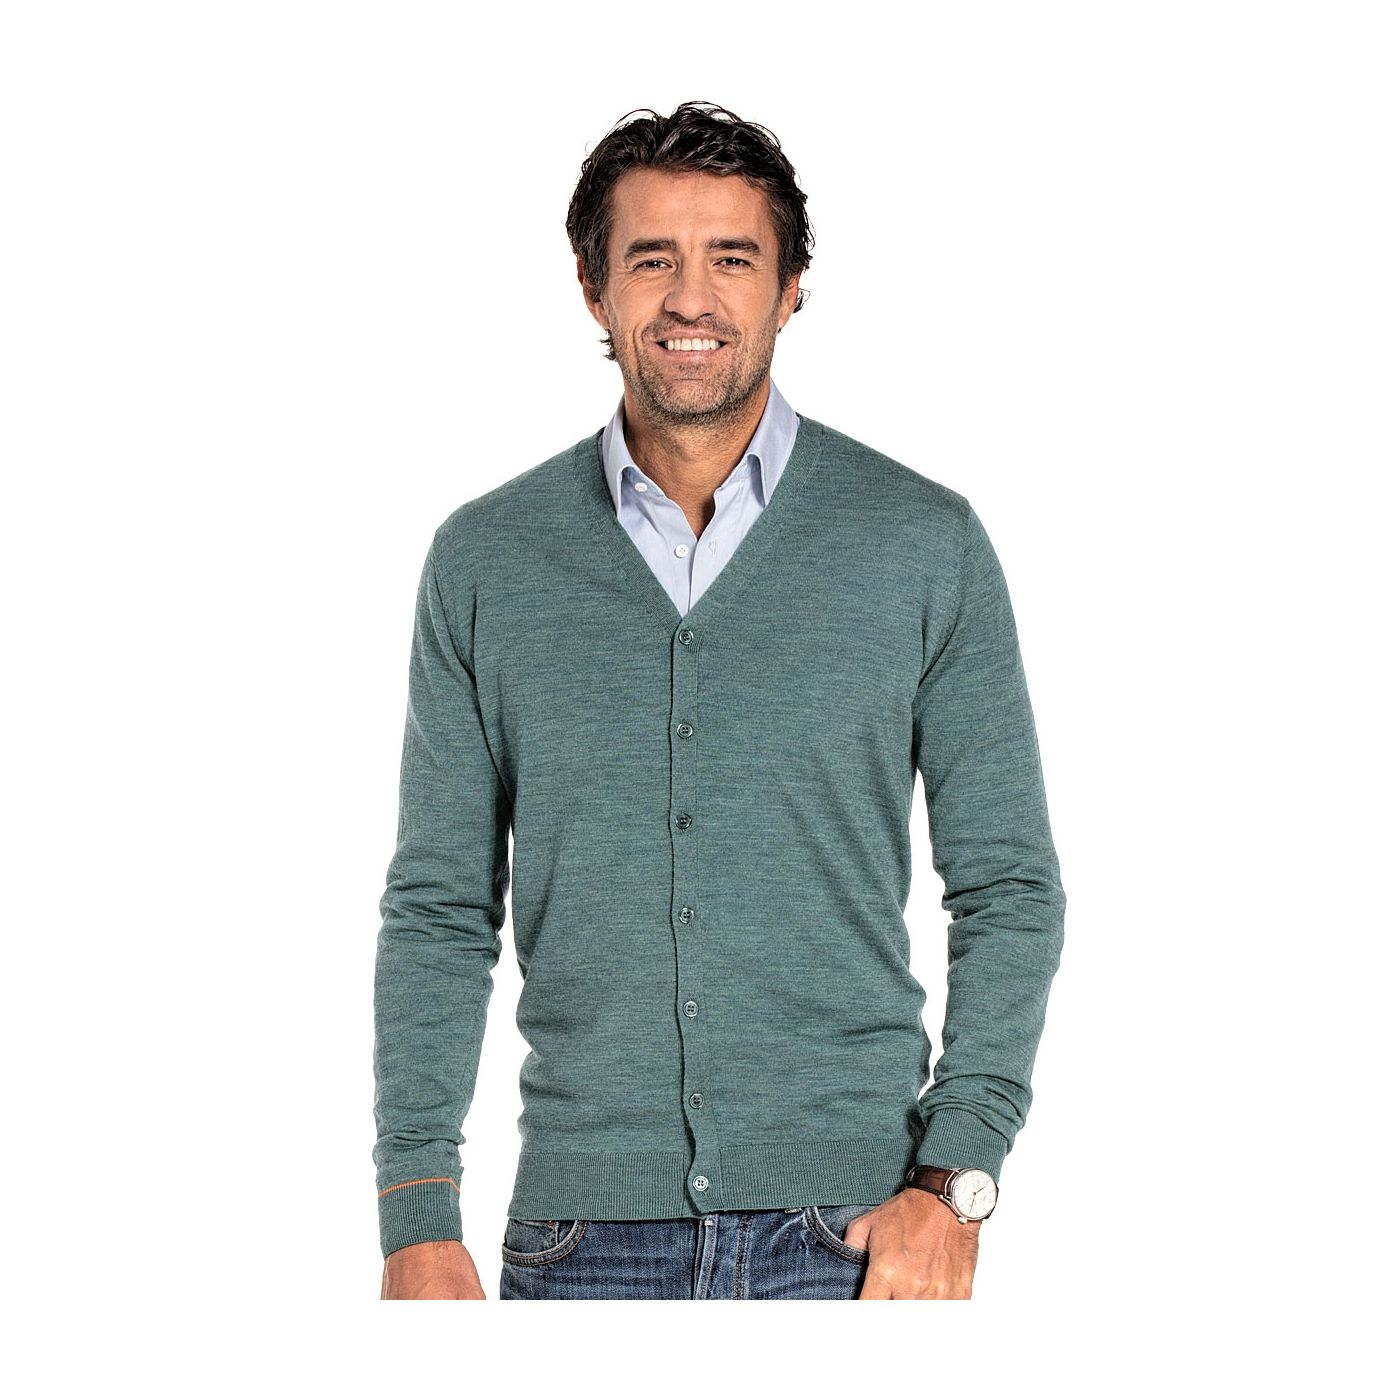 Cardigan for men made of Merino wool in Light green